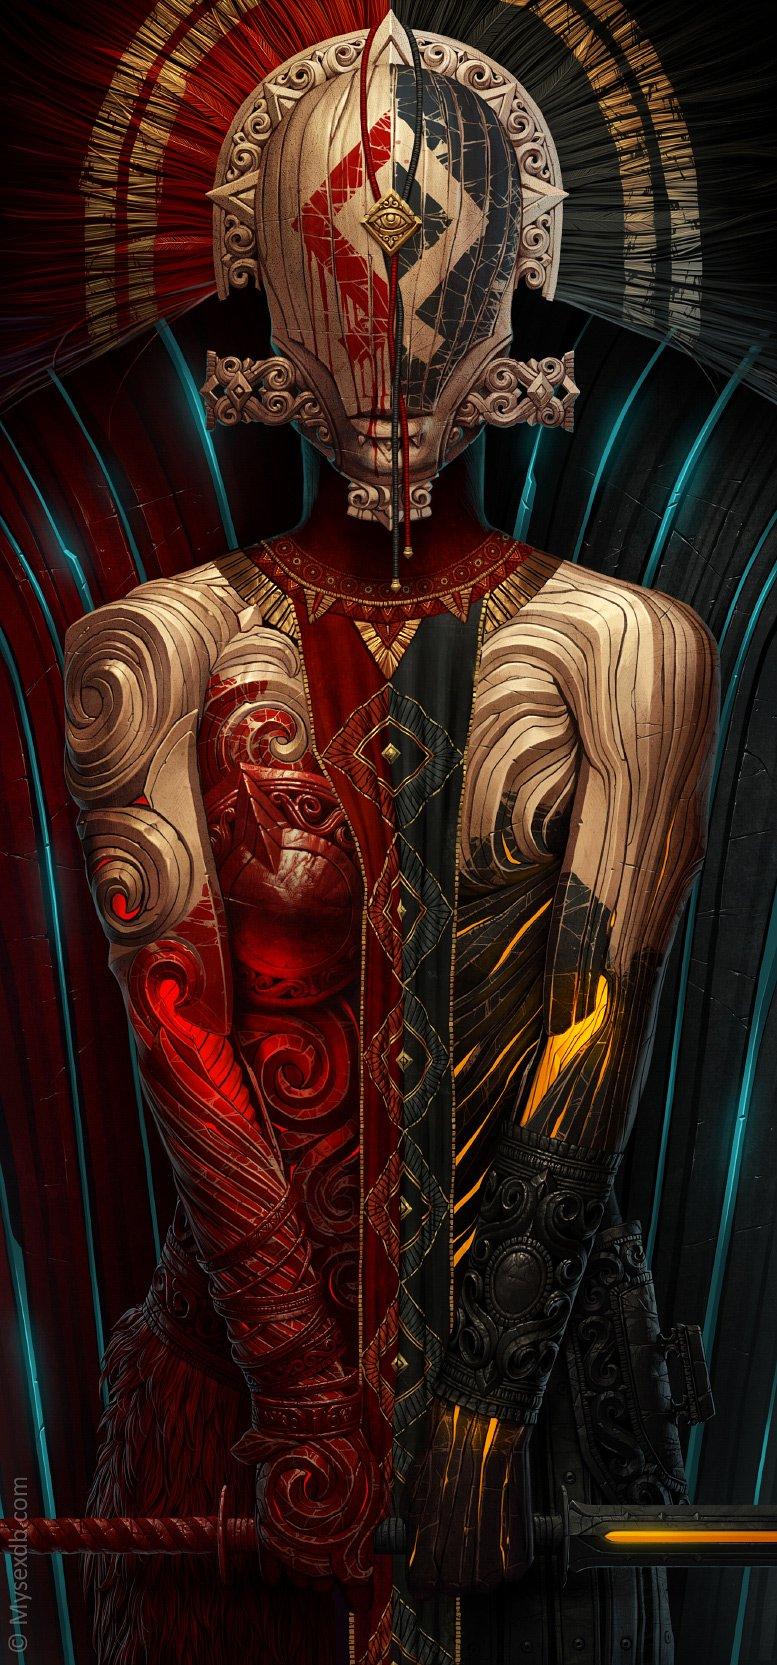 16 Souls - Изображение 4